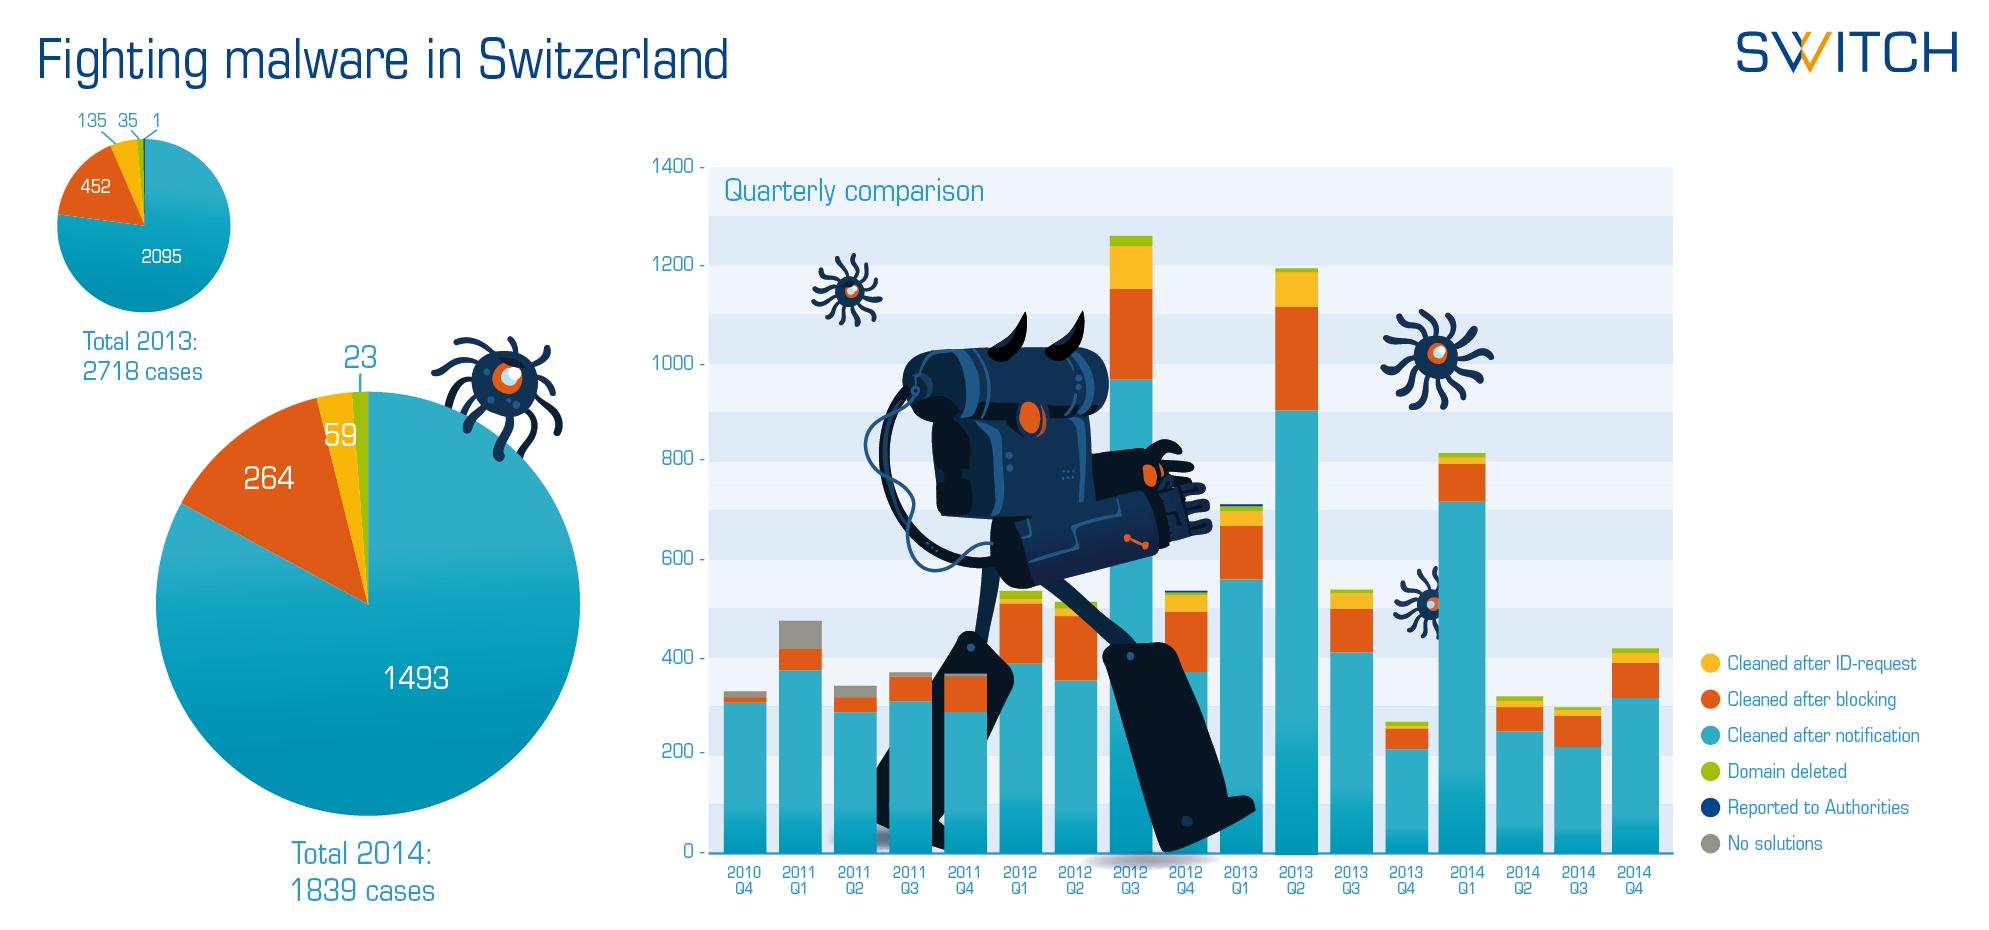 SWITCH Fighting Malware in Switzerland